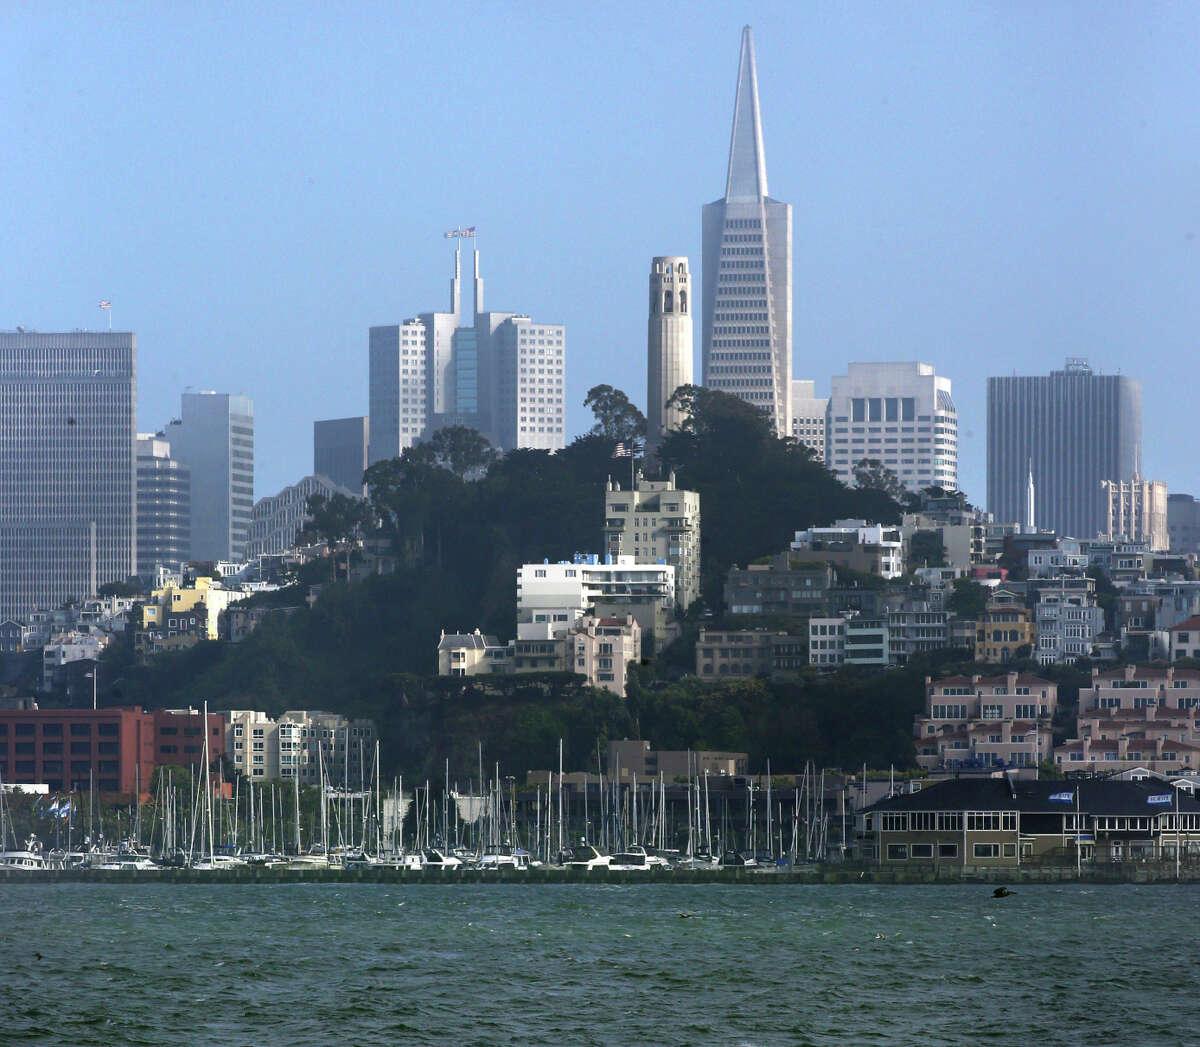 The skyline of San Francisco, Ca., on Thursday June 5, 2014, as seen from the Alcatraz Ferry.